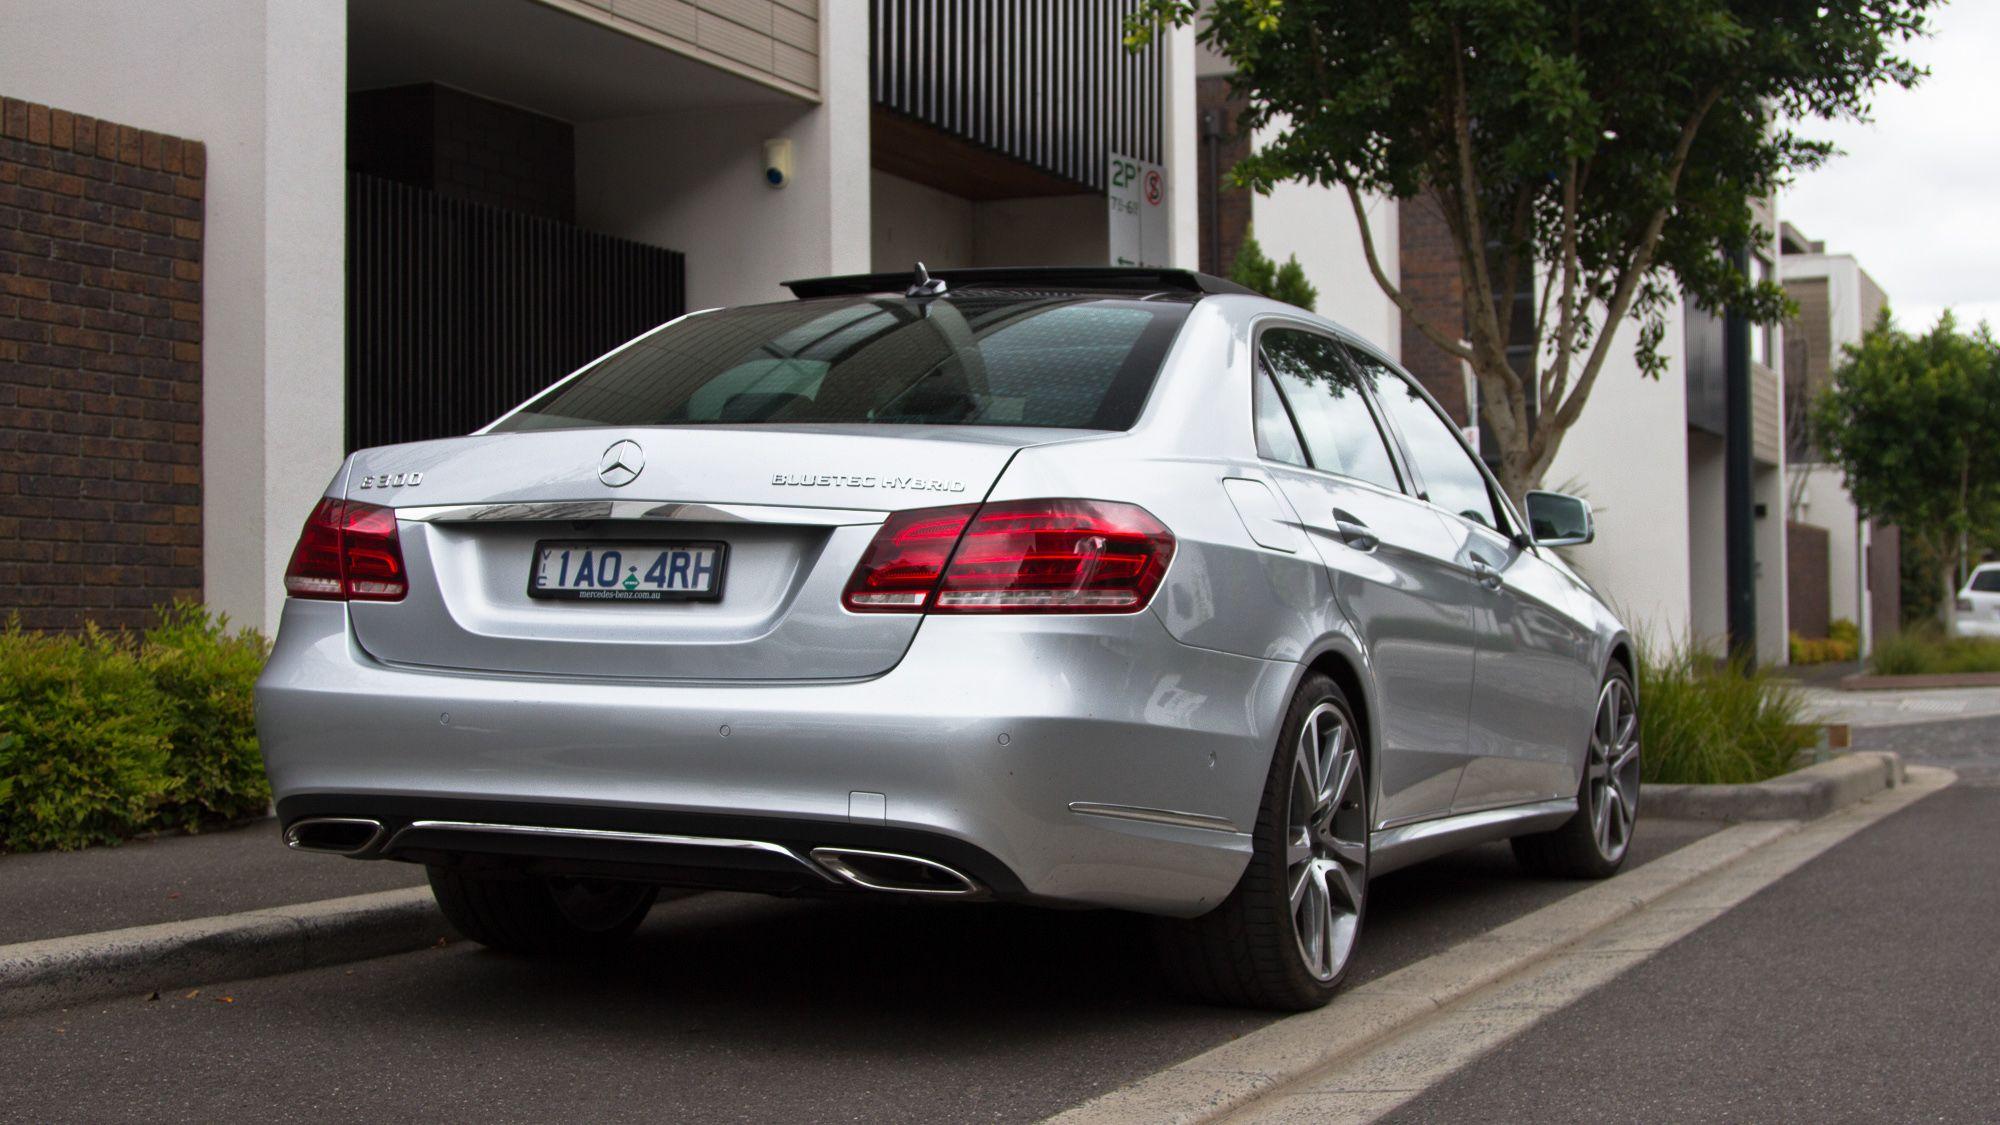 Mercedes-Benz E300 Bluetec Hybrid Review - http://www.caradvice.com.au/315910/mercedes-benz-e300-bluetec-hybrid-review/